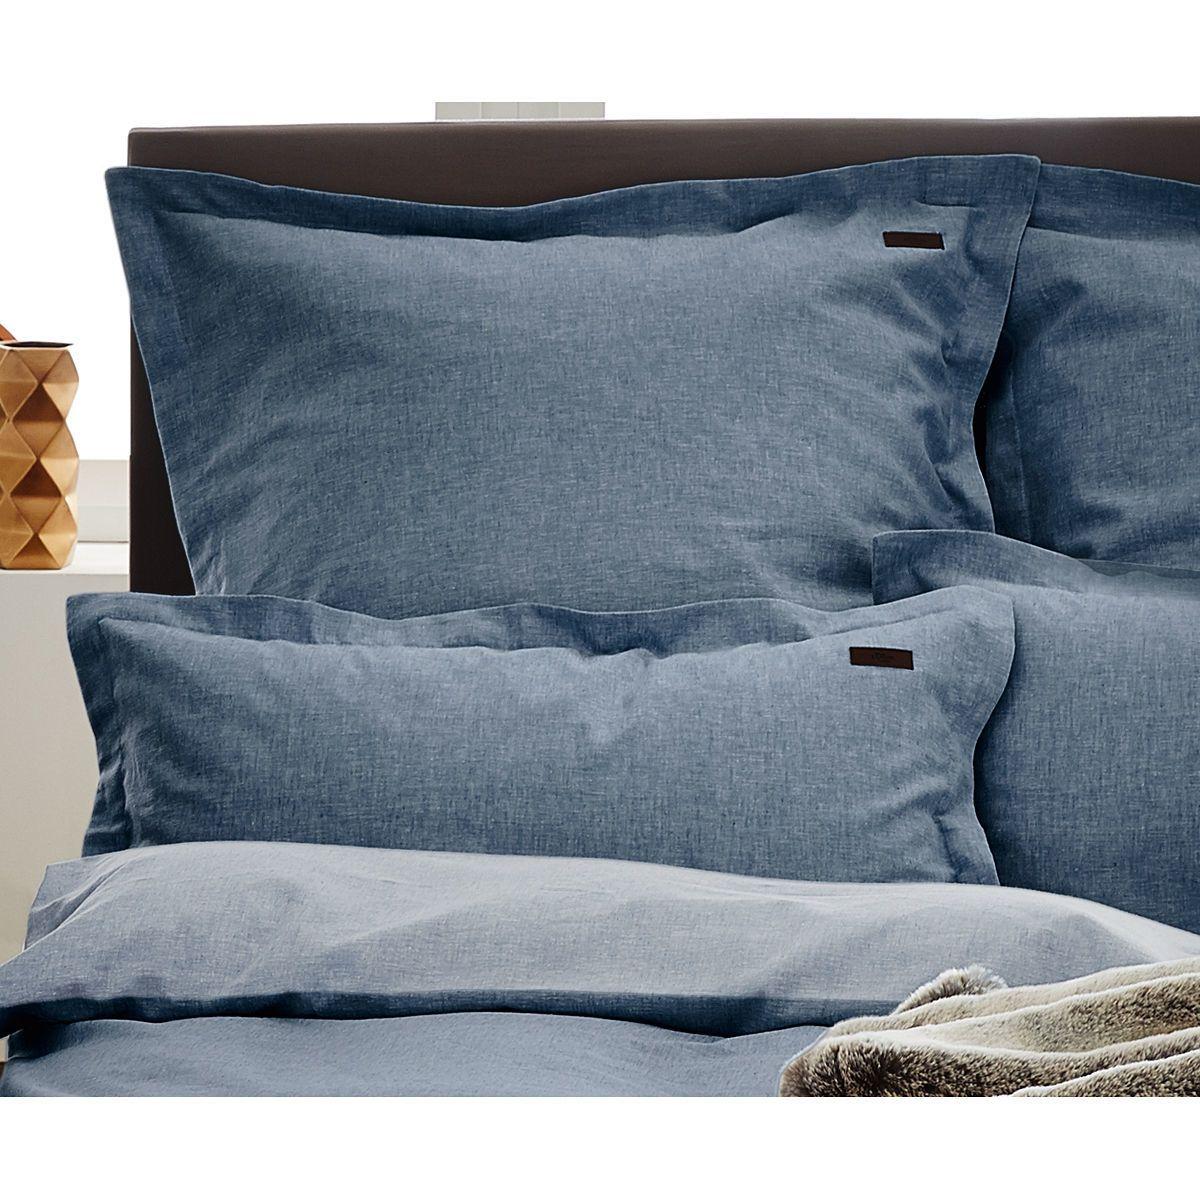 bettw sche 155 220 kissenbezug 40 80 my blog. Black Bedroom Furniture Sets. Home Design Ideas